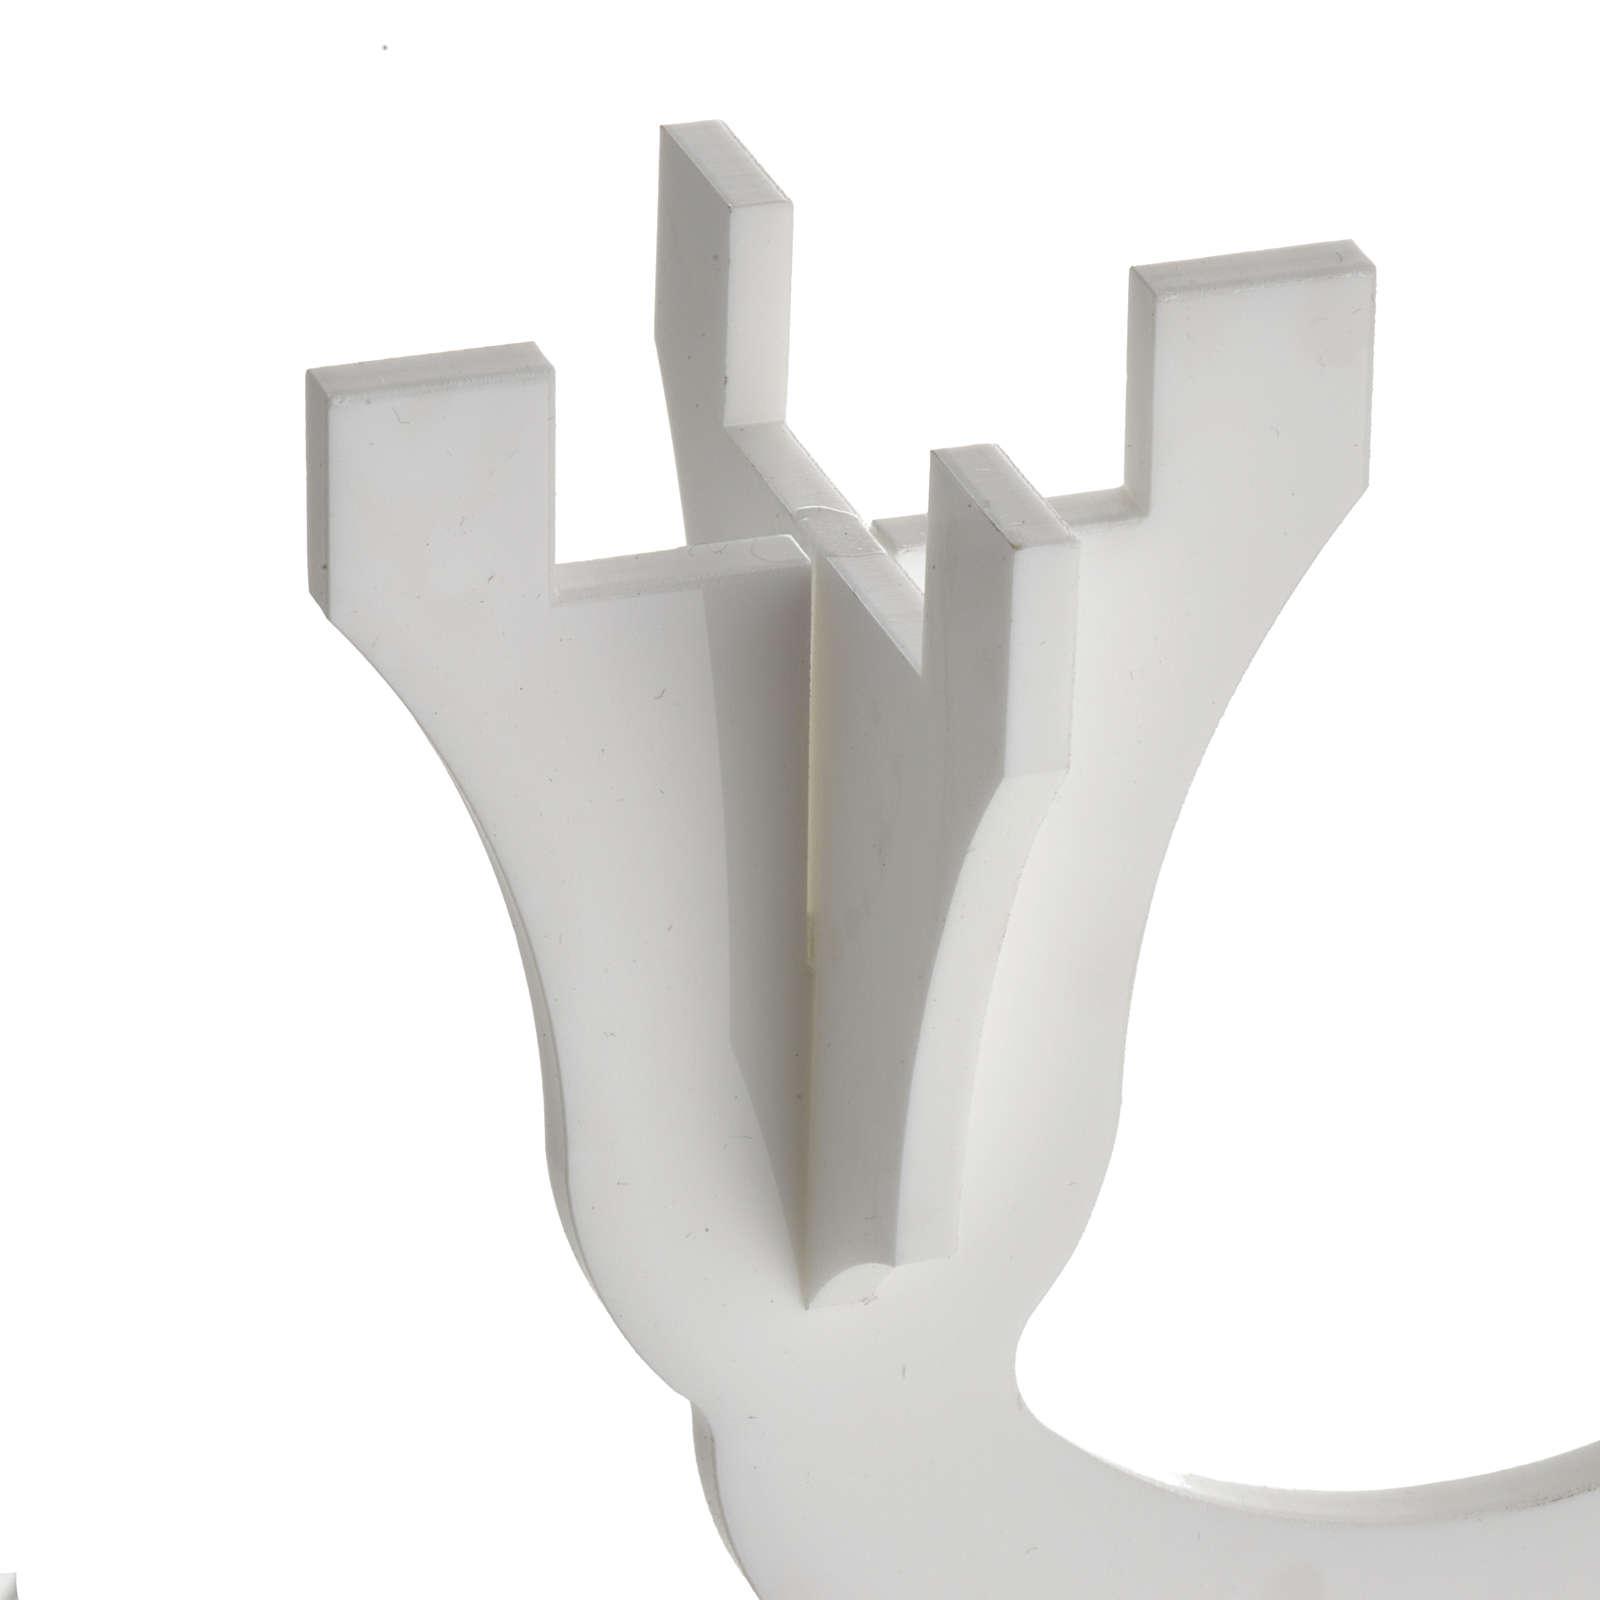 Candelabro in plexiglass bianco 3 fiamme 4